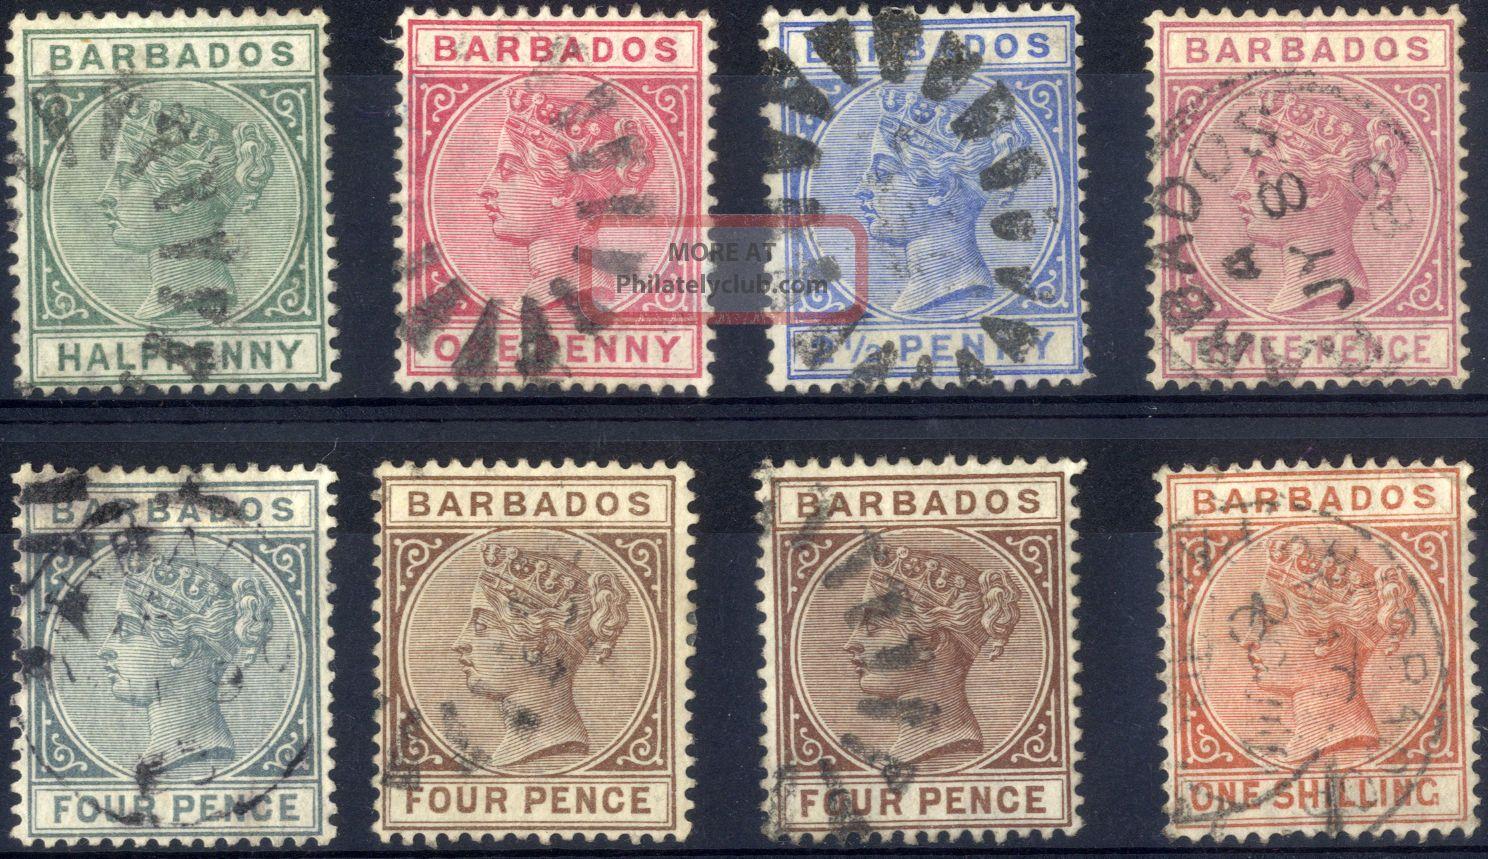 Barbados - Sg 89 - 102 (between) - 1882 - 86 - Definitive Values - British Colonies & Territories photo